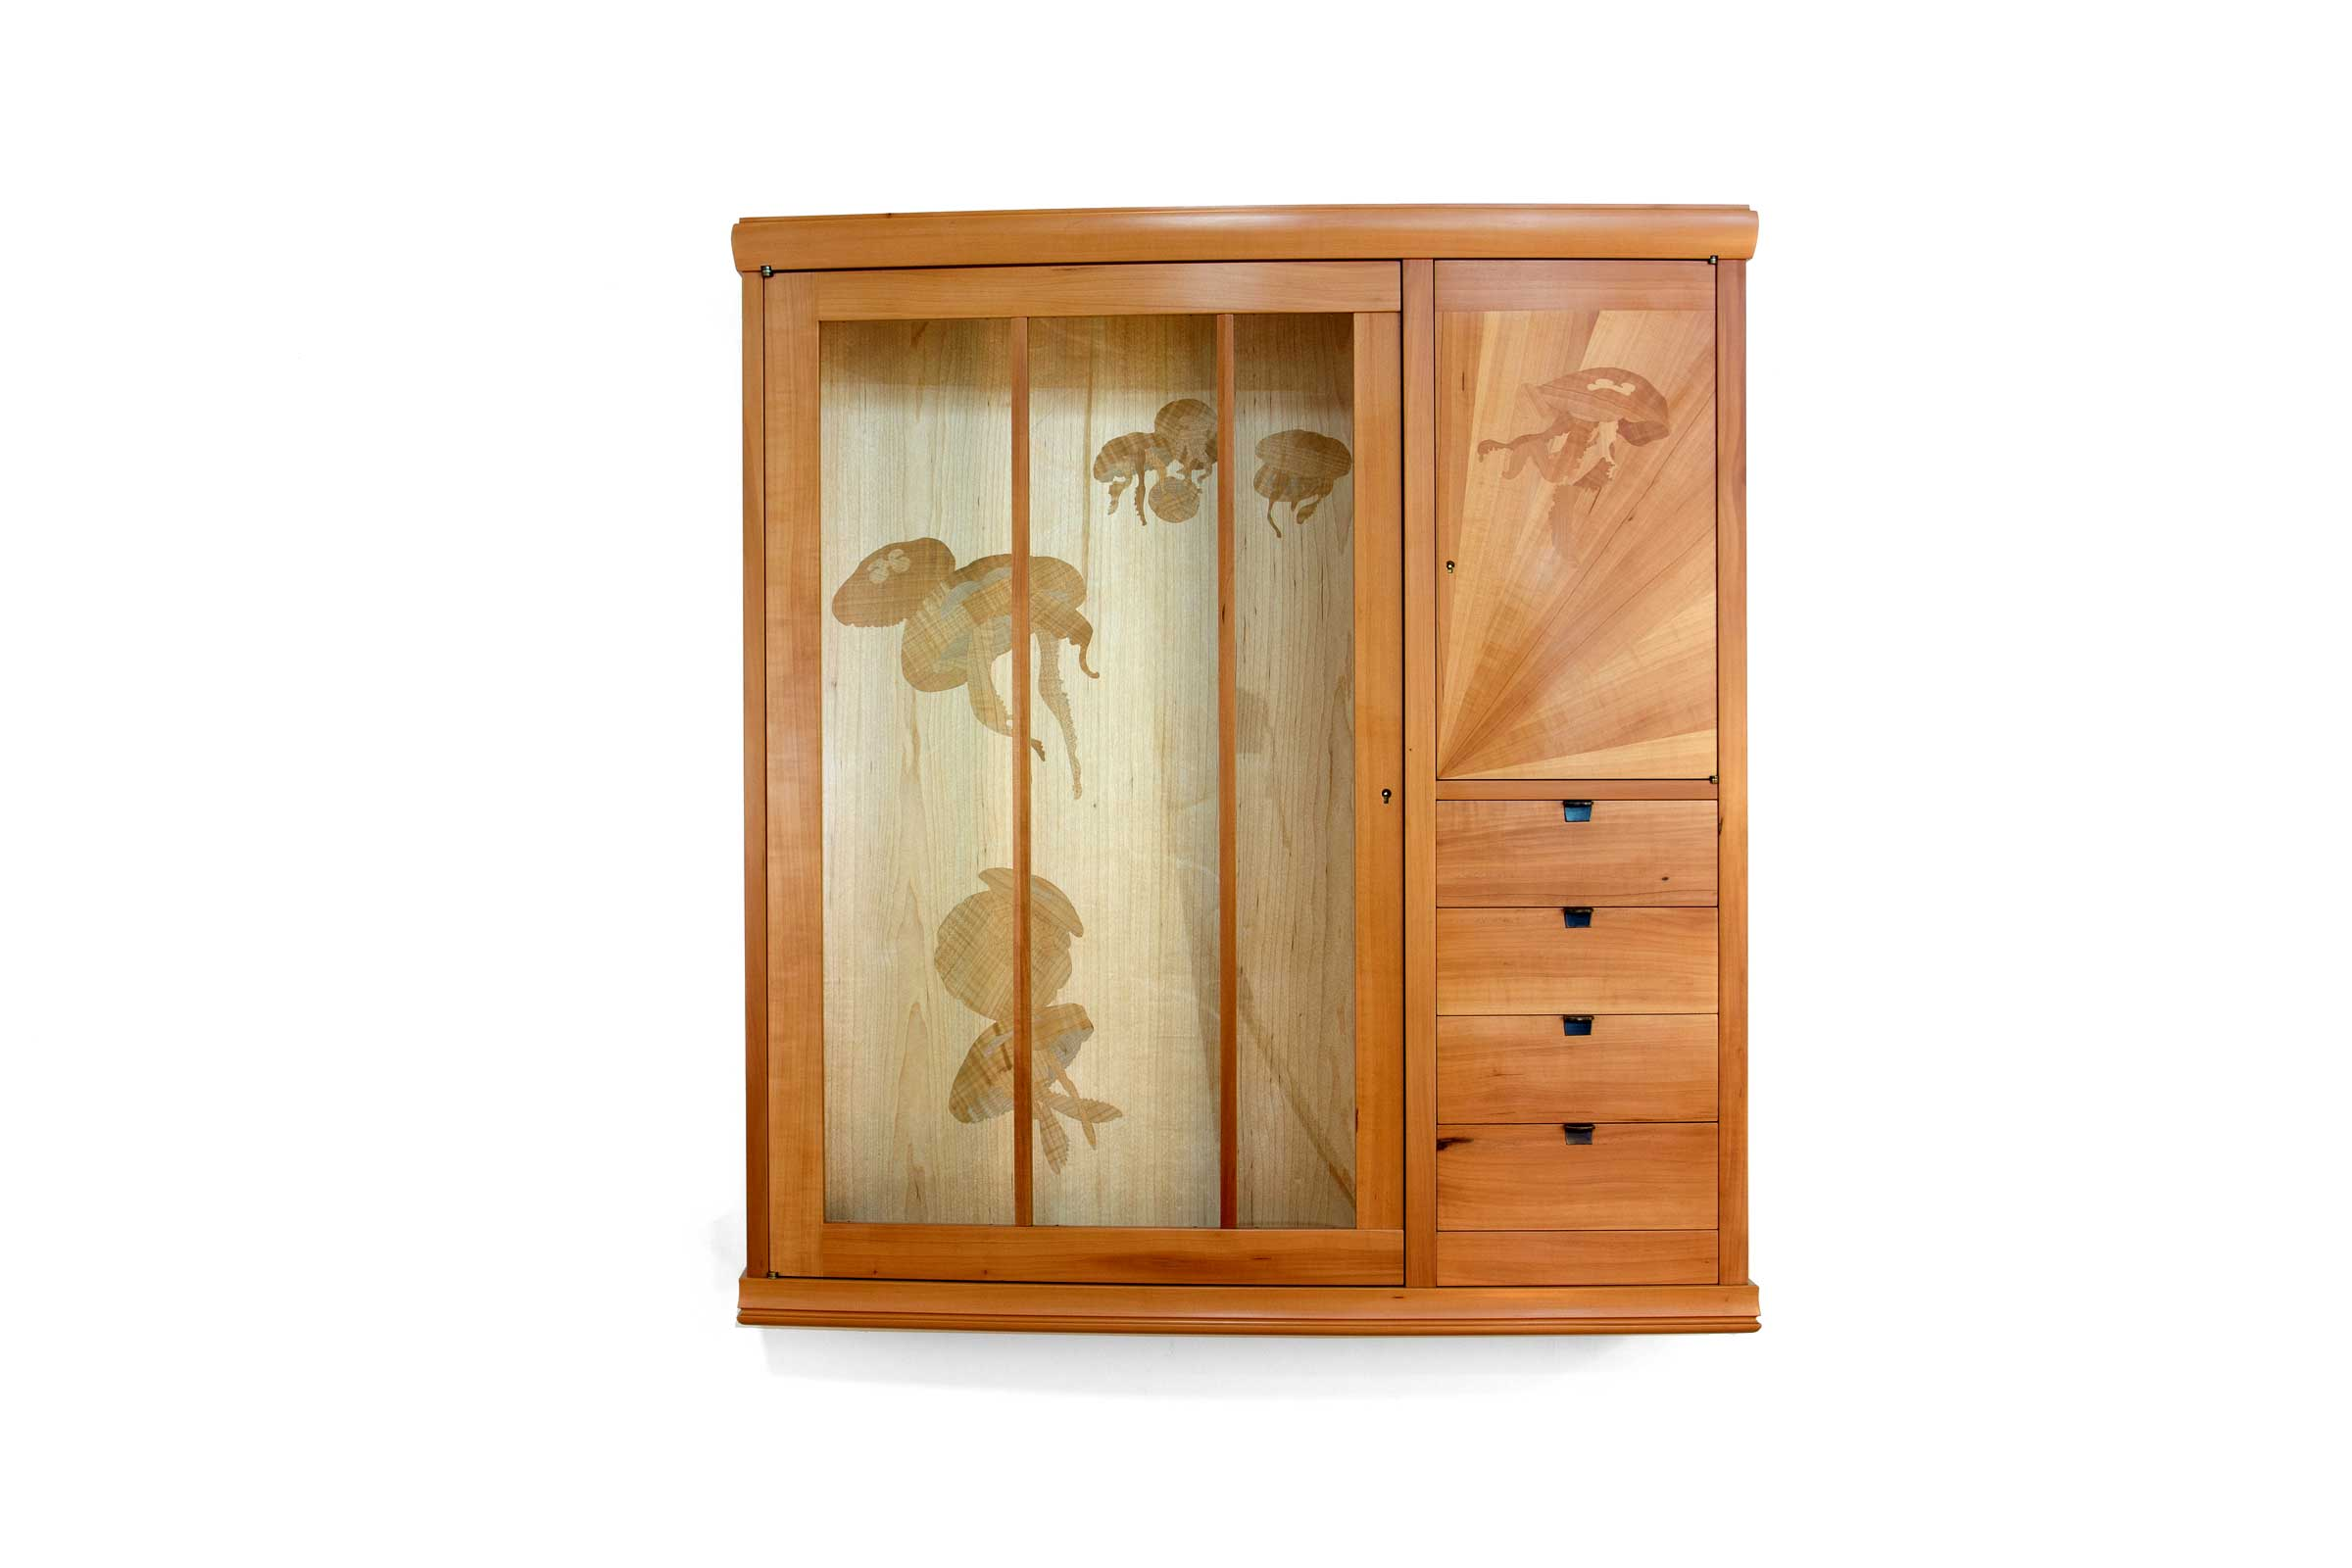 Jellyfish Cabinet - Jay T. Scott